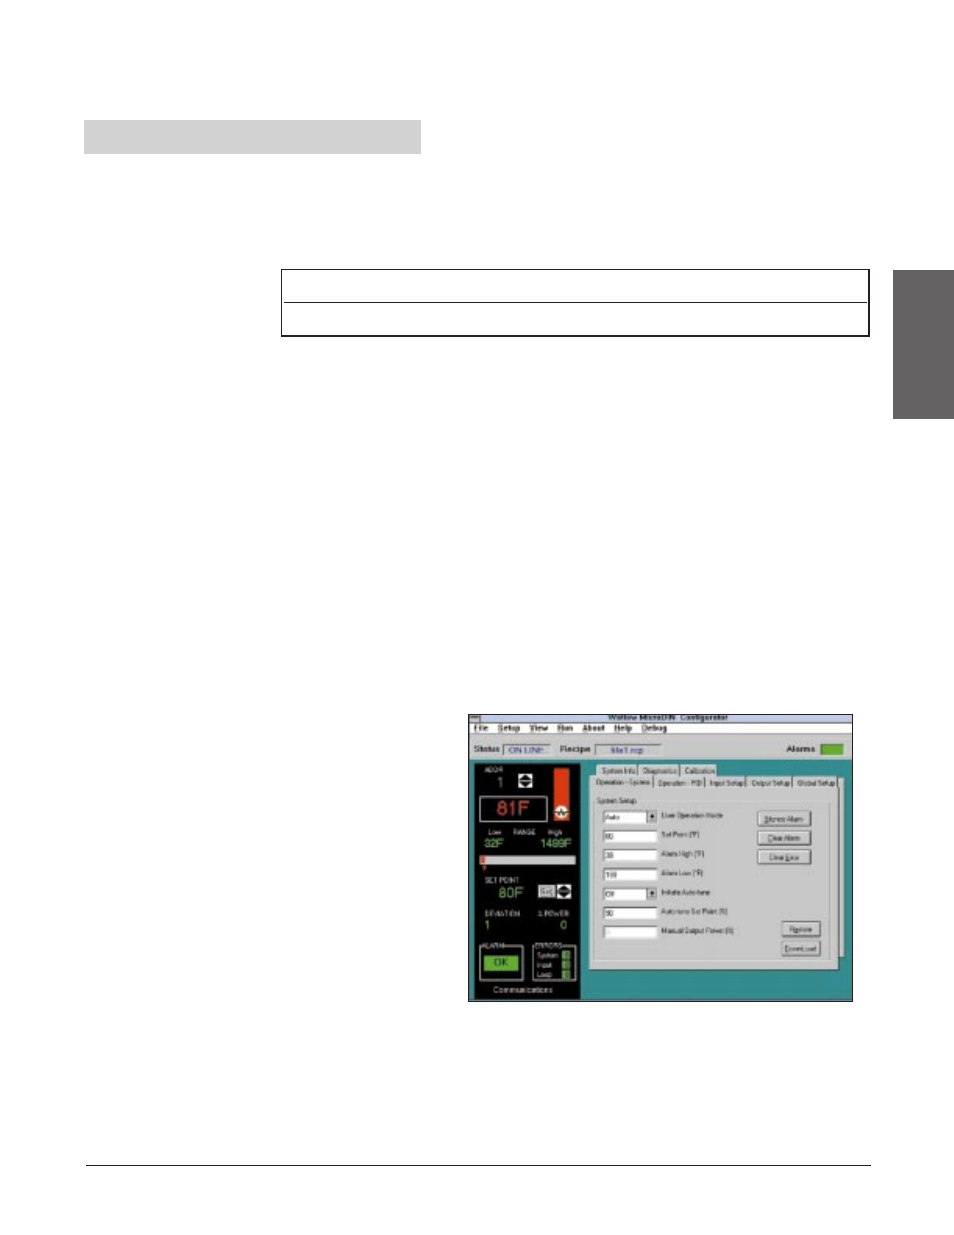 Serial Data Format Microdin Installation Wiring Tasks Modbus Rtu Communications Software Watlink Watlow User Manual Page 19 106